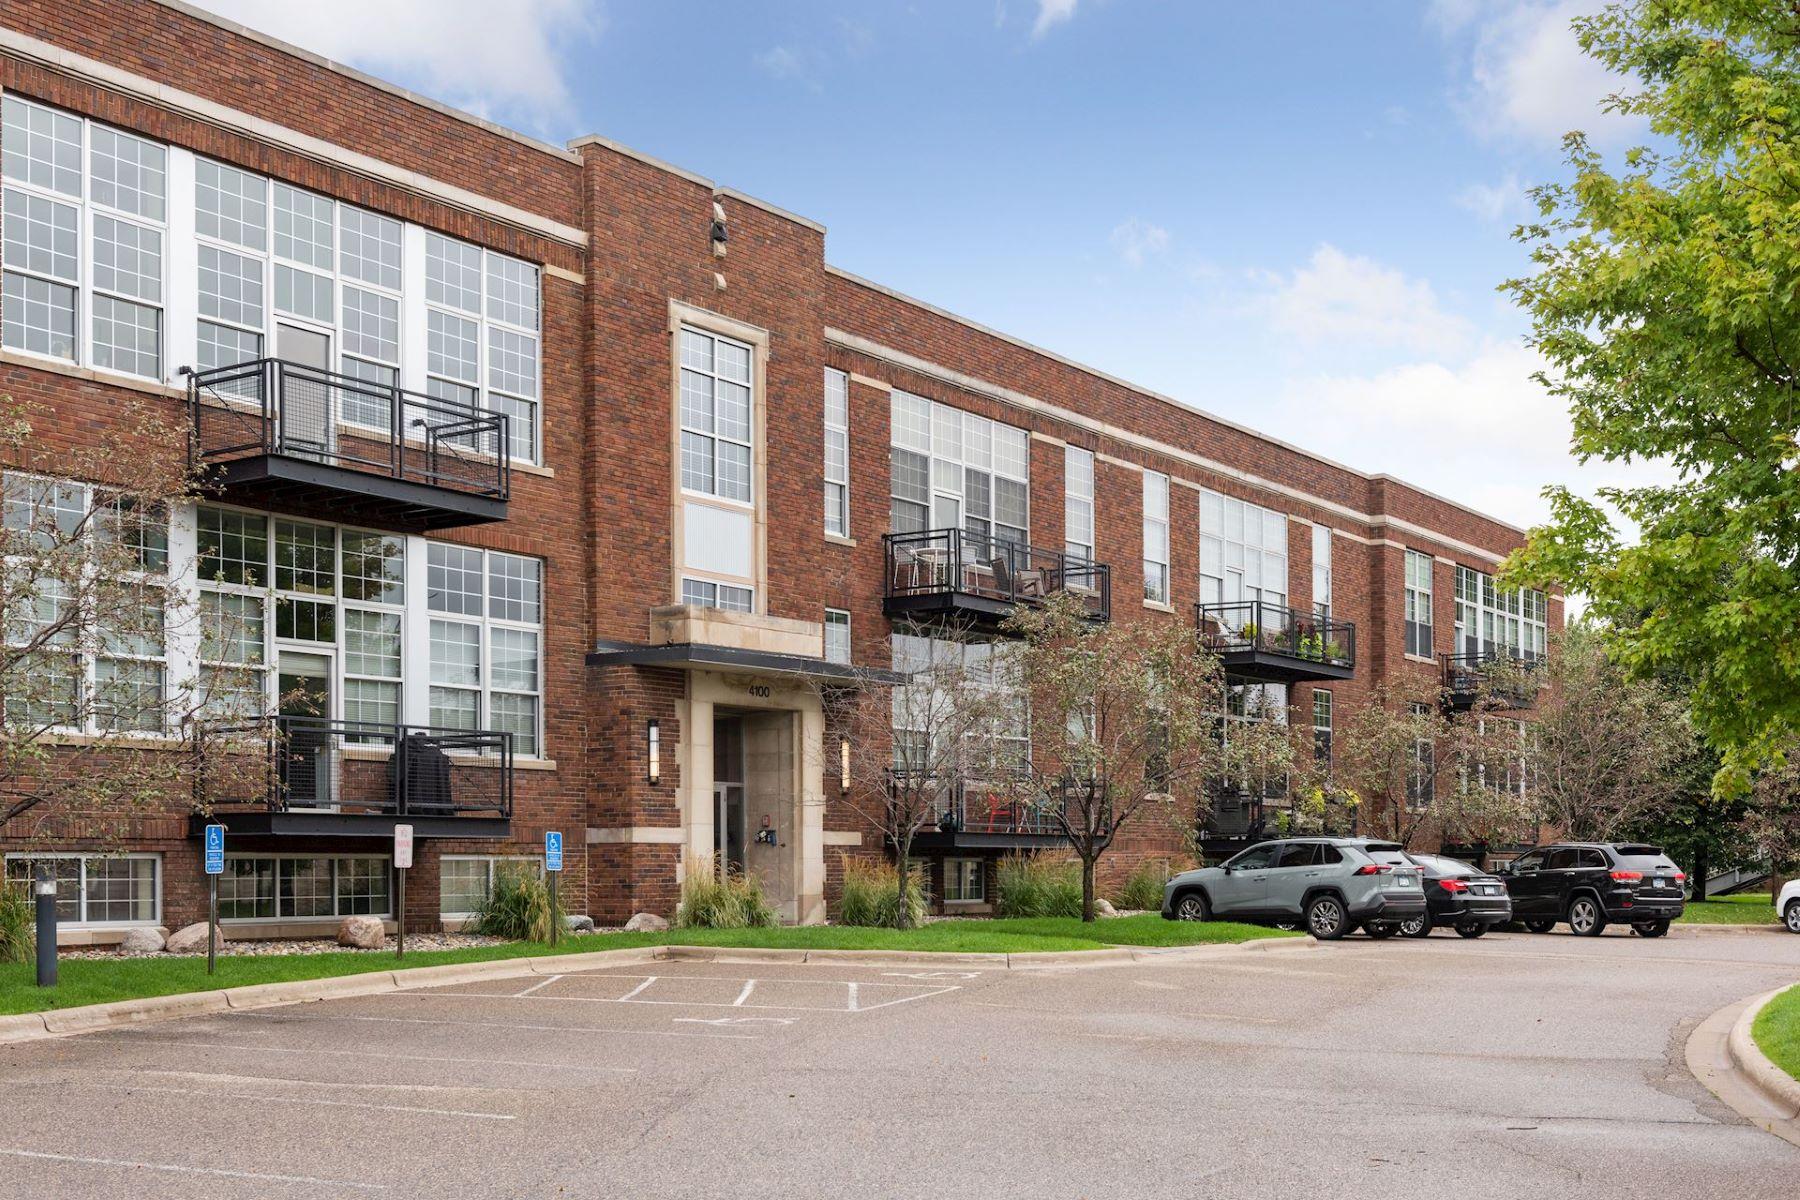 Condominiums for Sale at 4100 Vernon Avenue S #112 4100 Vernon Avenue S #112 St. Louis Park, Minnesota 55416 United States